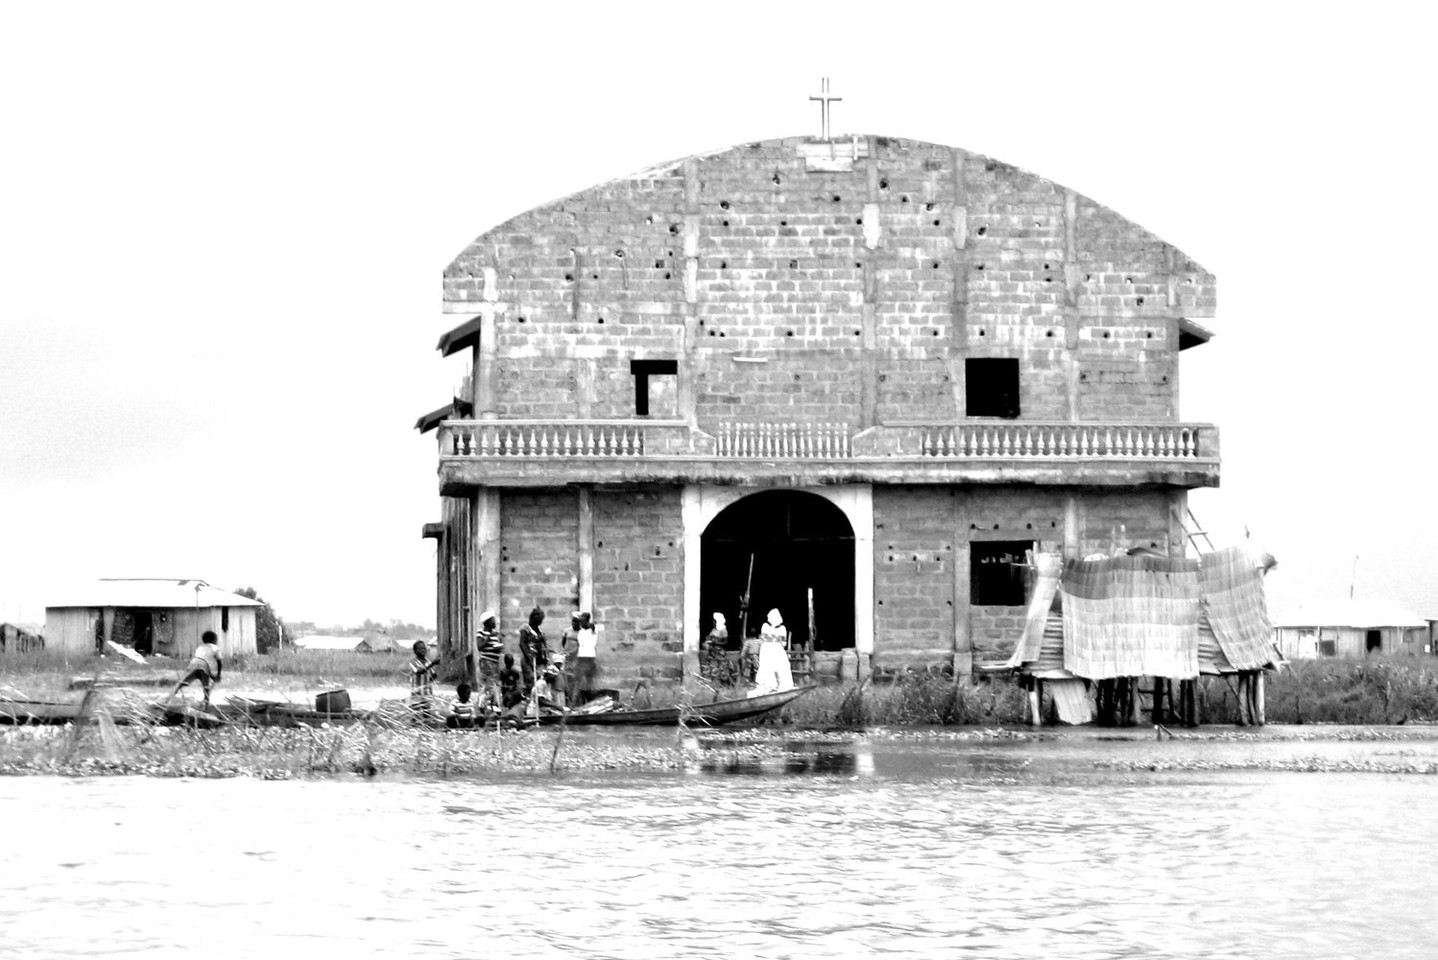 Church on the water - Ganvié - Africa